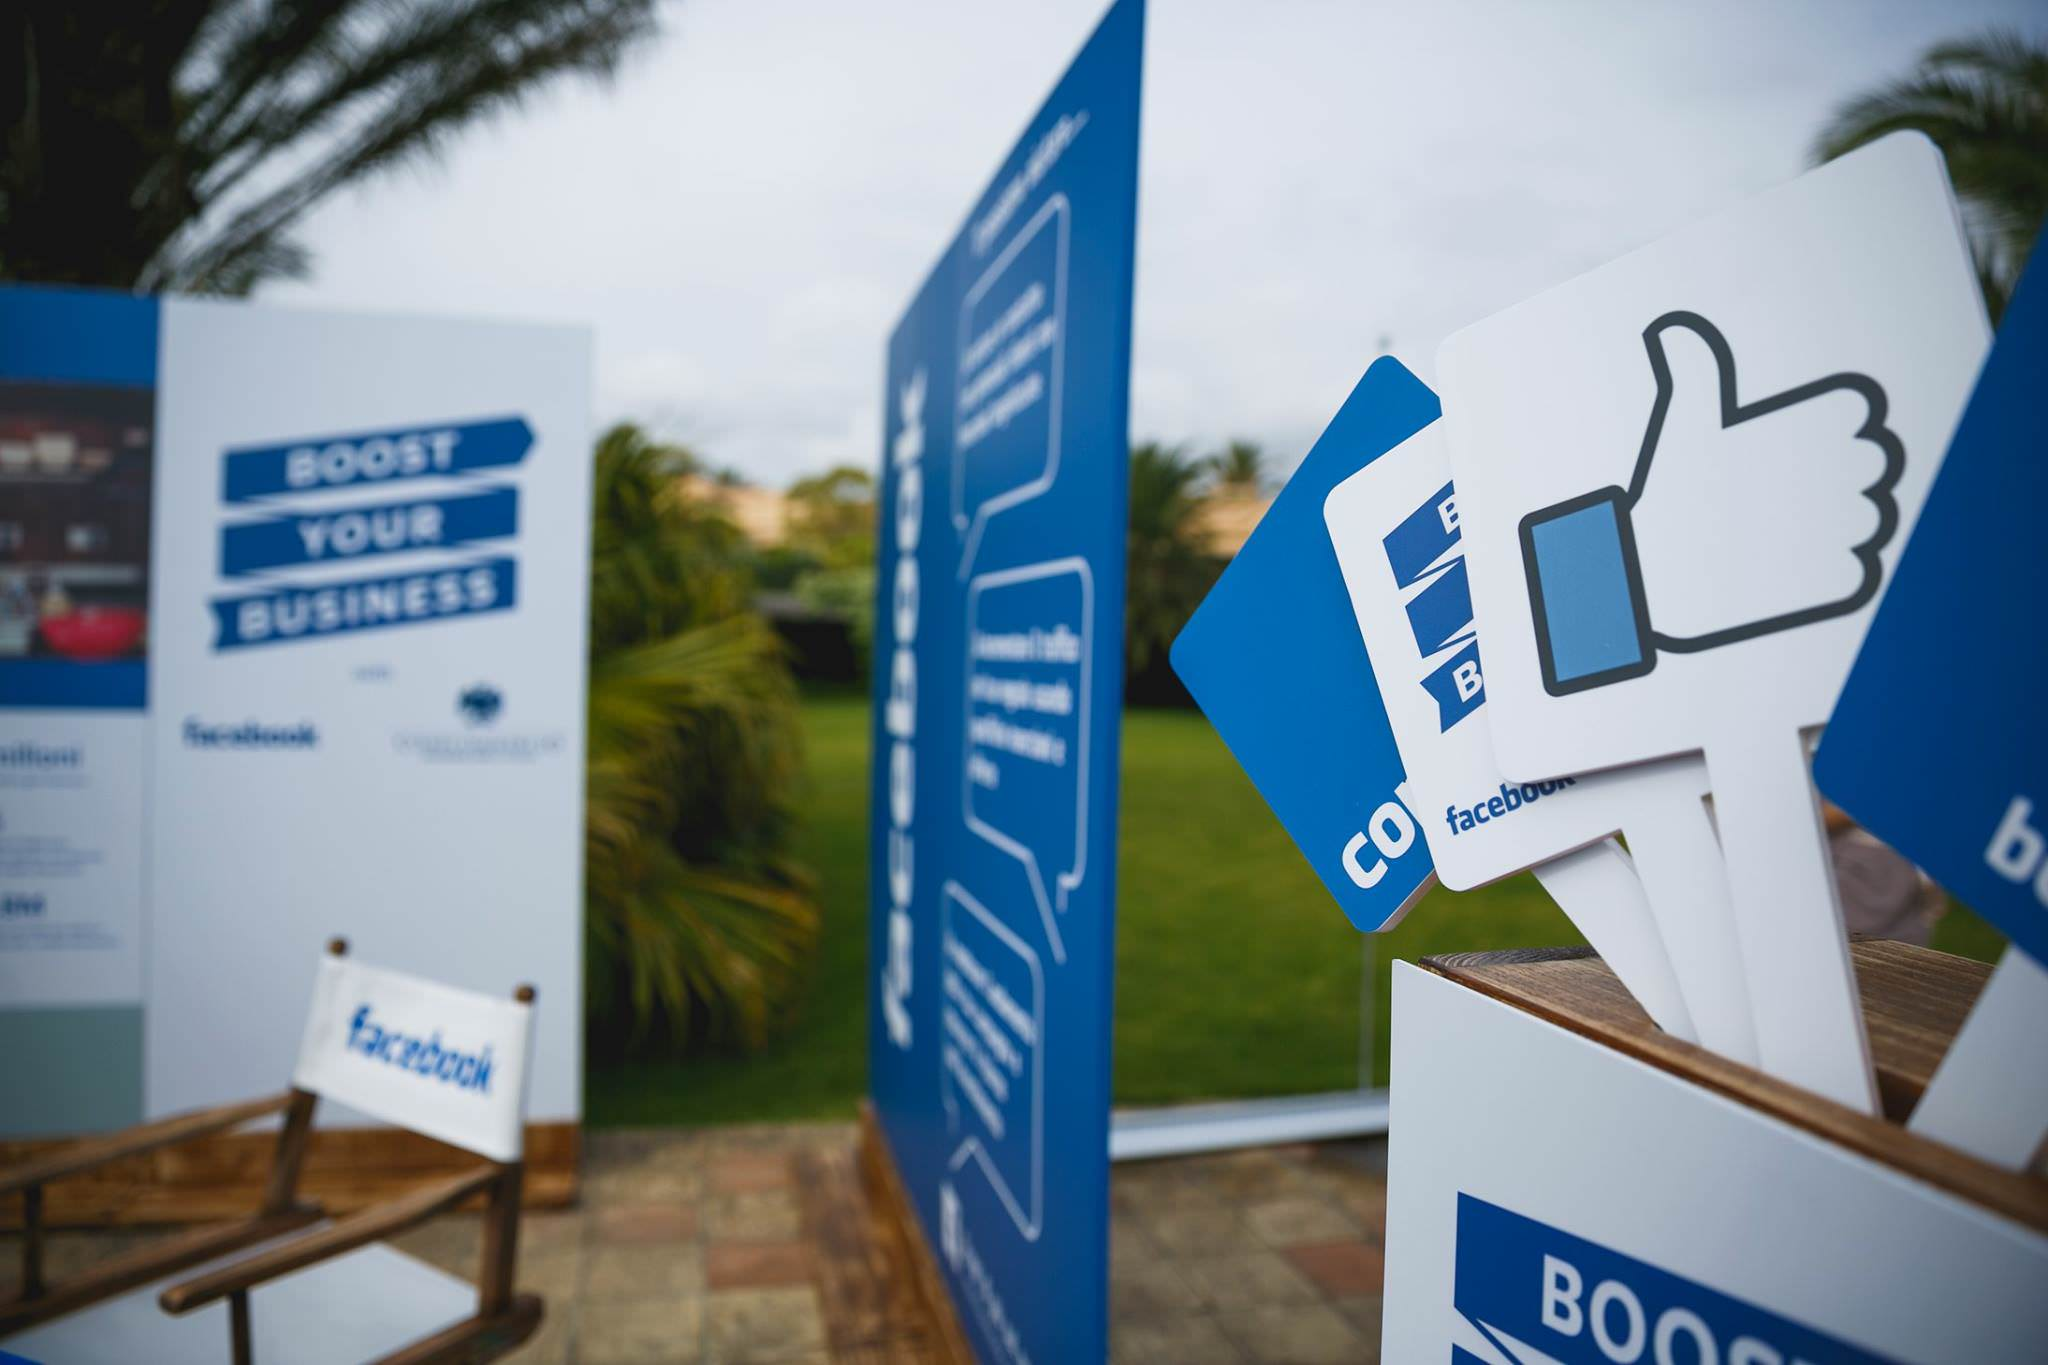 facebook-boost-your-business-gruppo-peroni-eventi-01